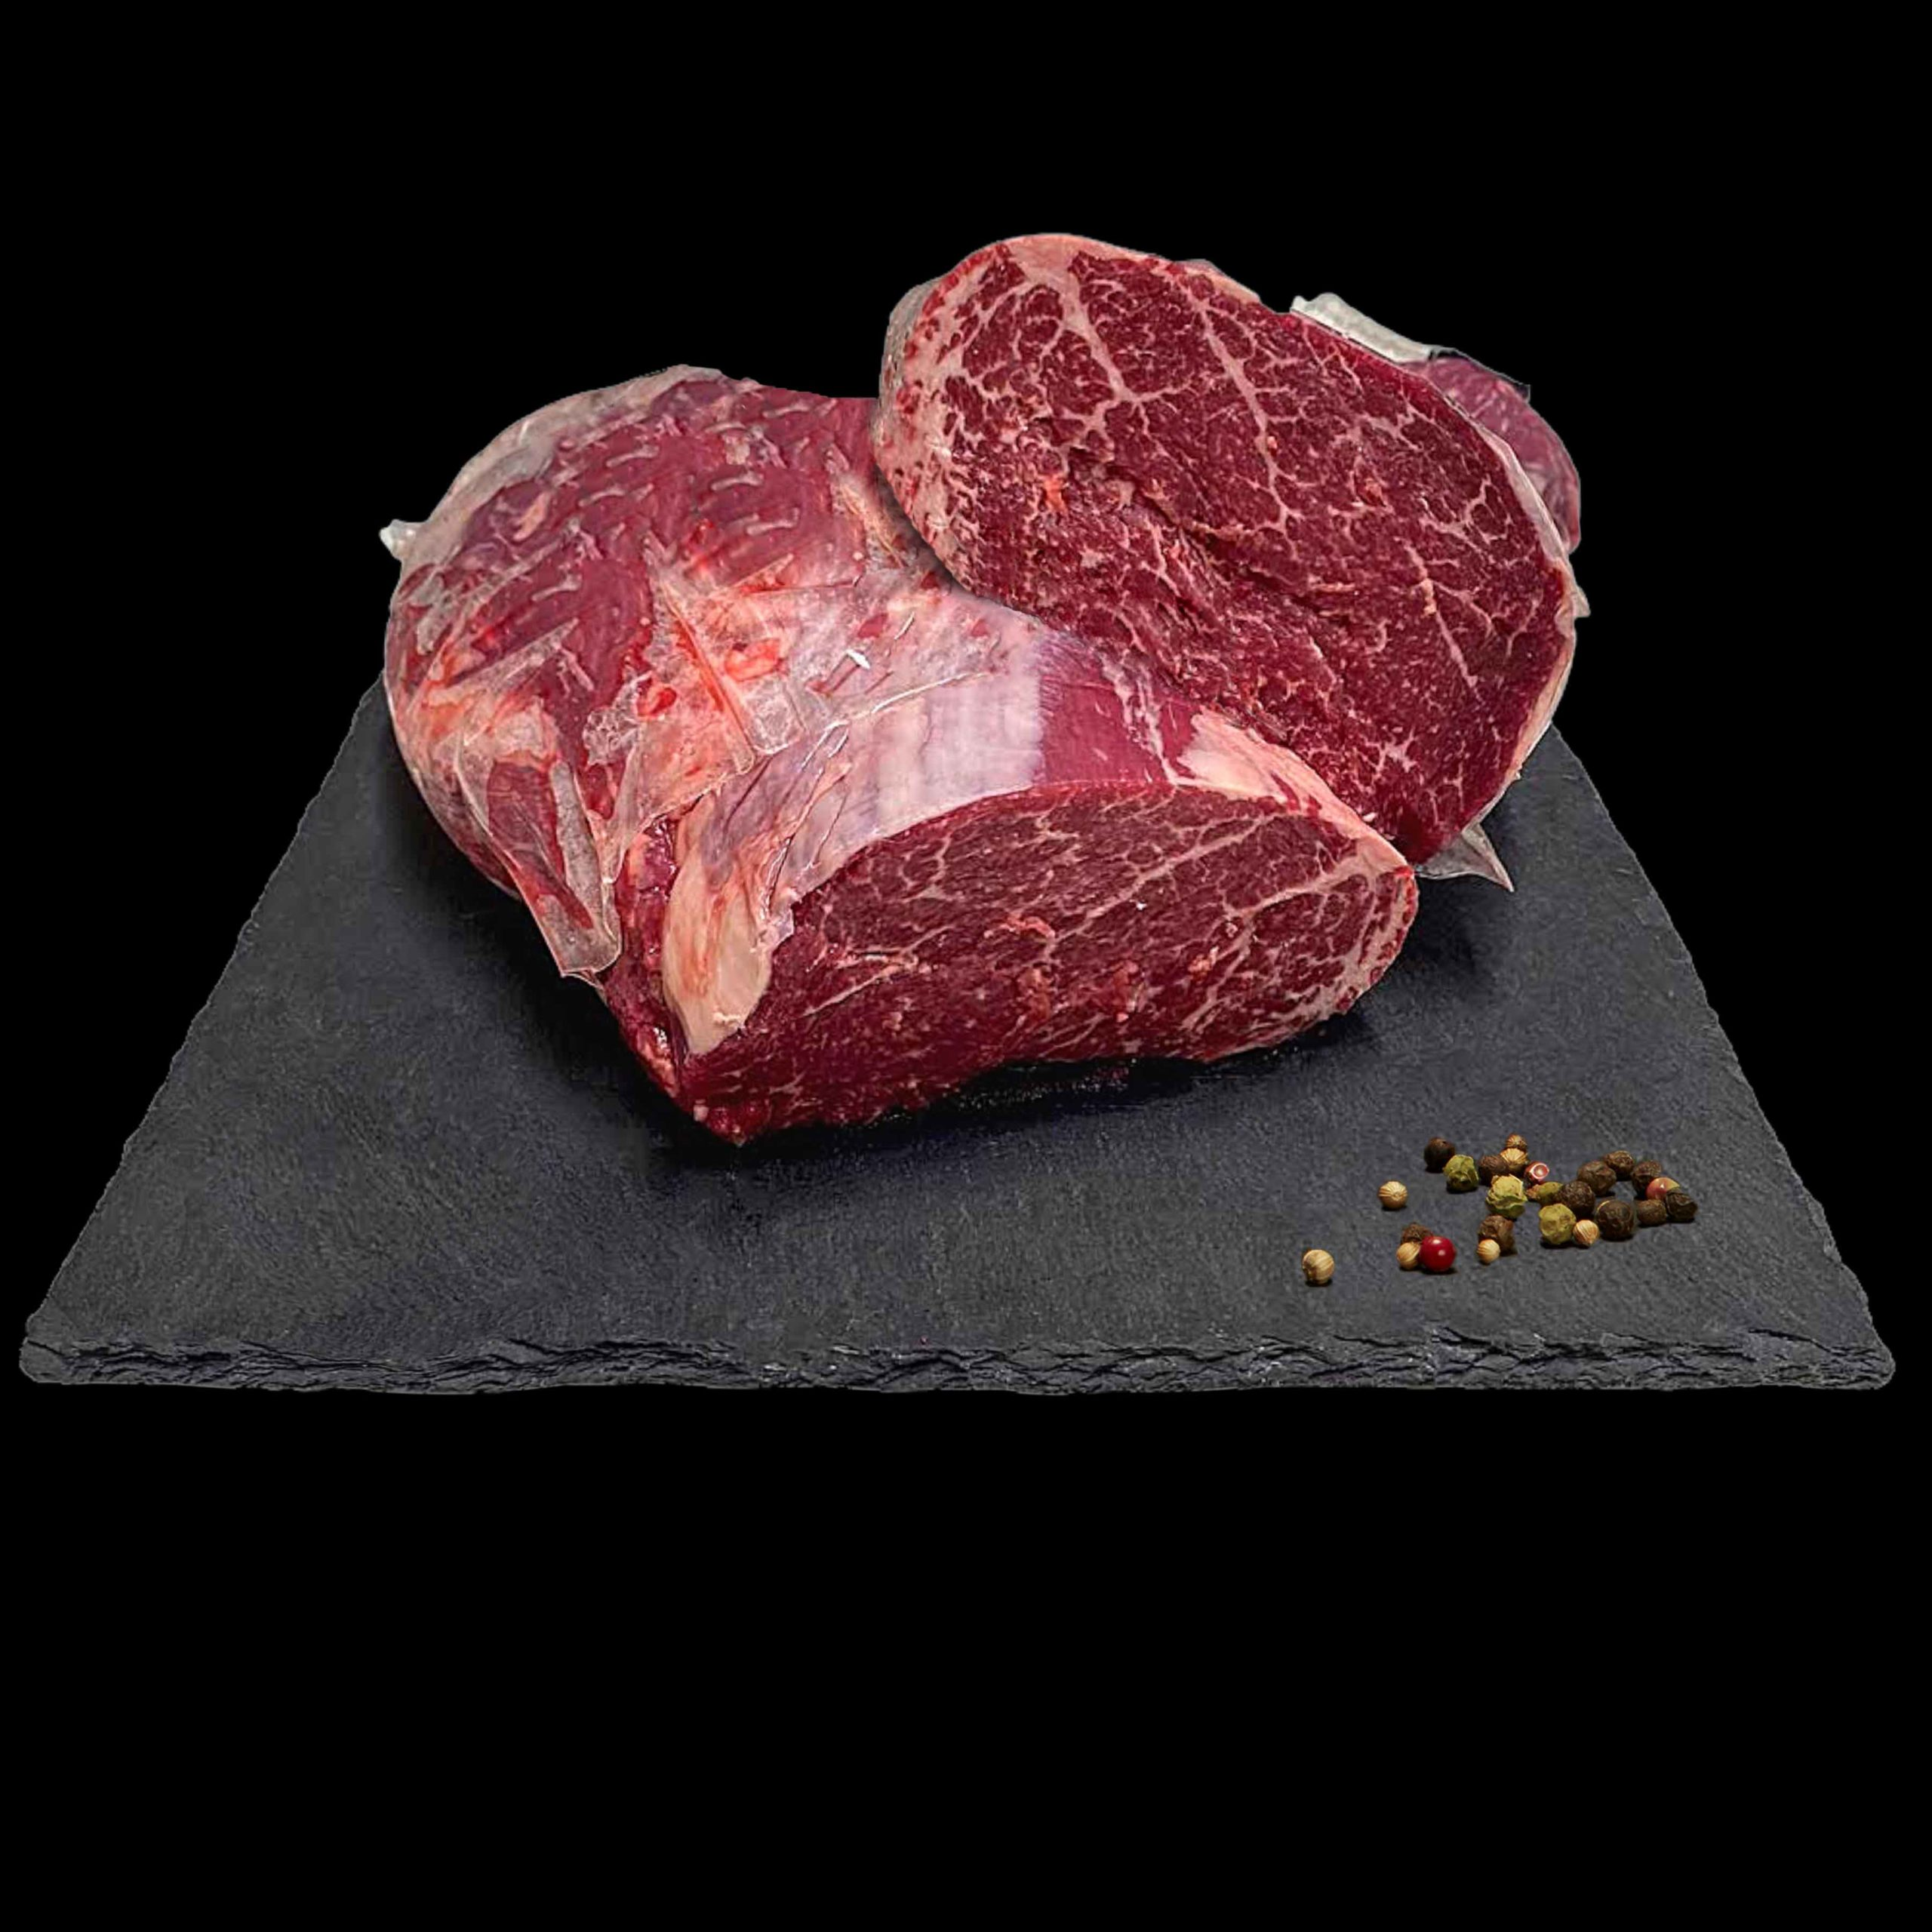 Filetto Black Angus USA premium Kansas Ranch carne vendita online